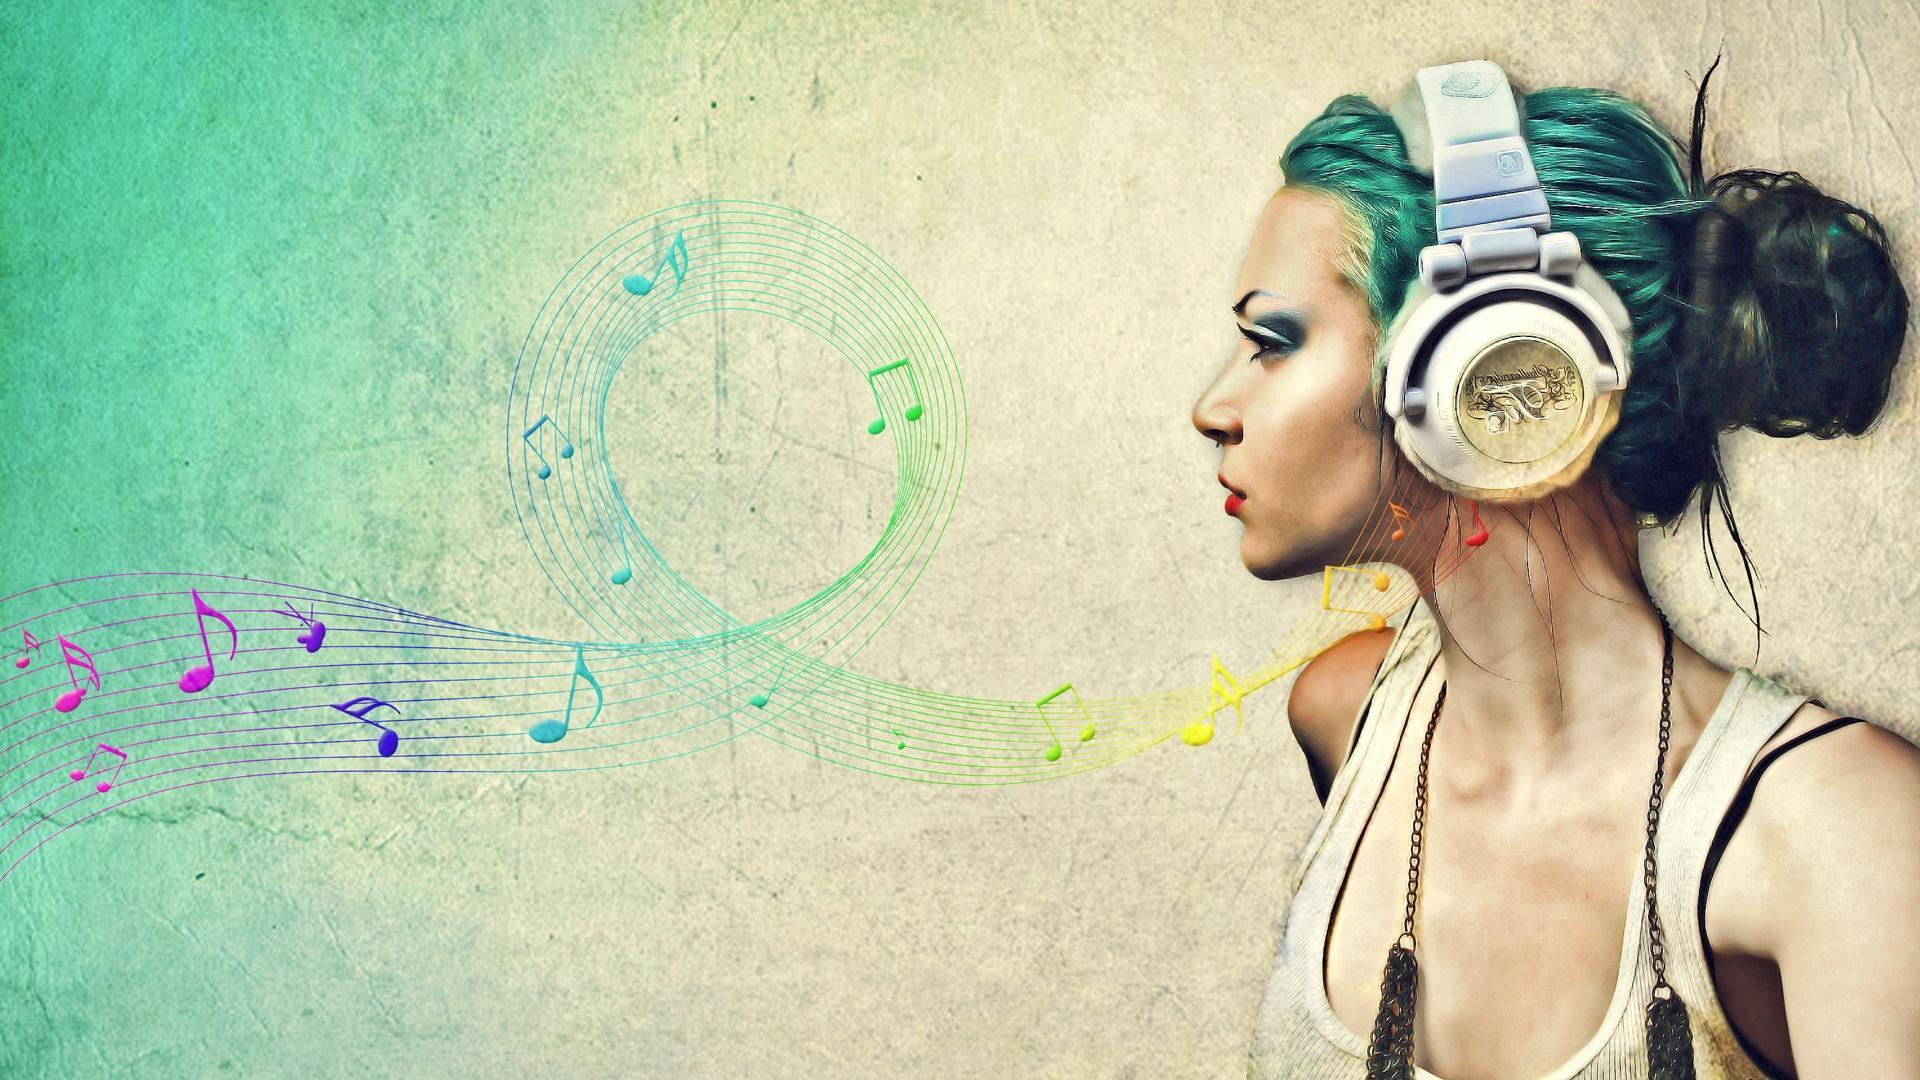 Music Desktop Backgrounds   Wallpaper High Definition High Quality 1920x1080